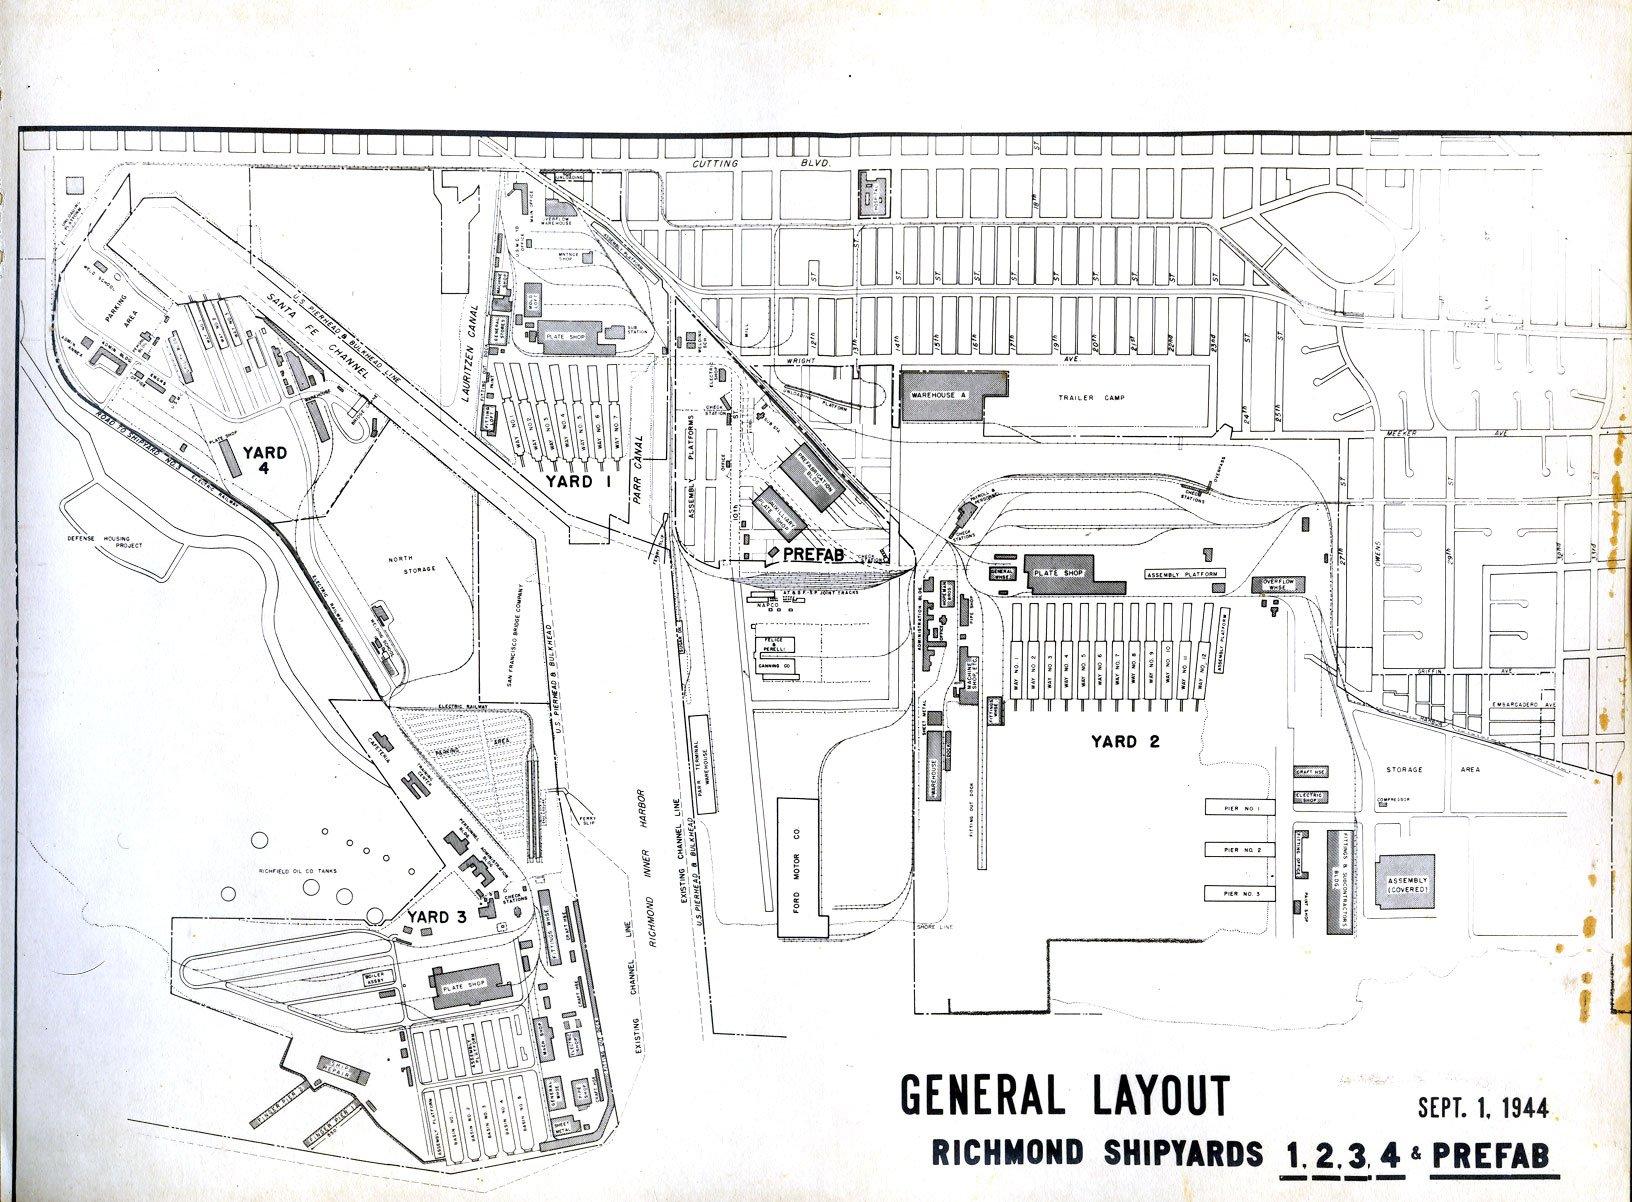 General historic layout of the Richmond shipyards (SanPedro.com)